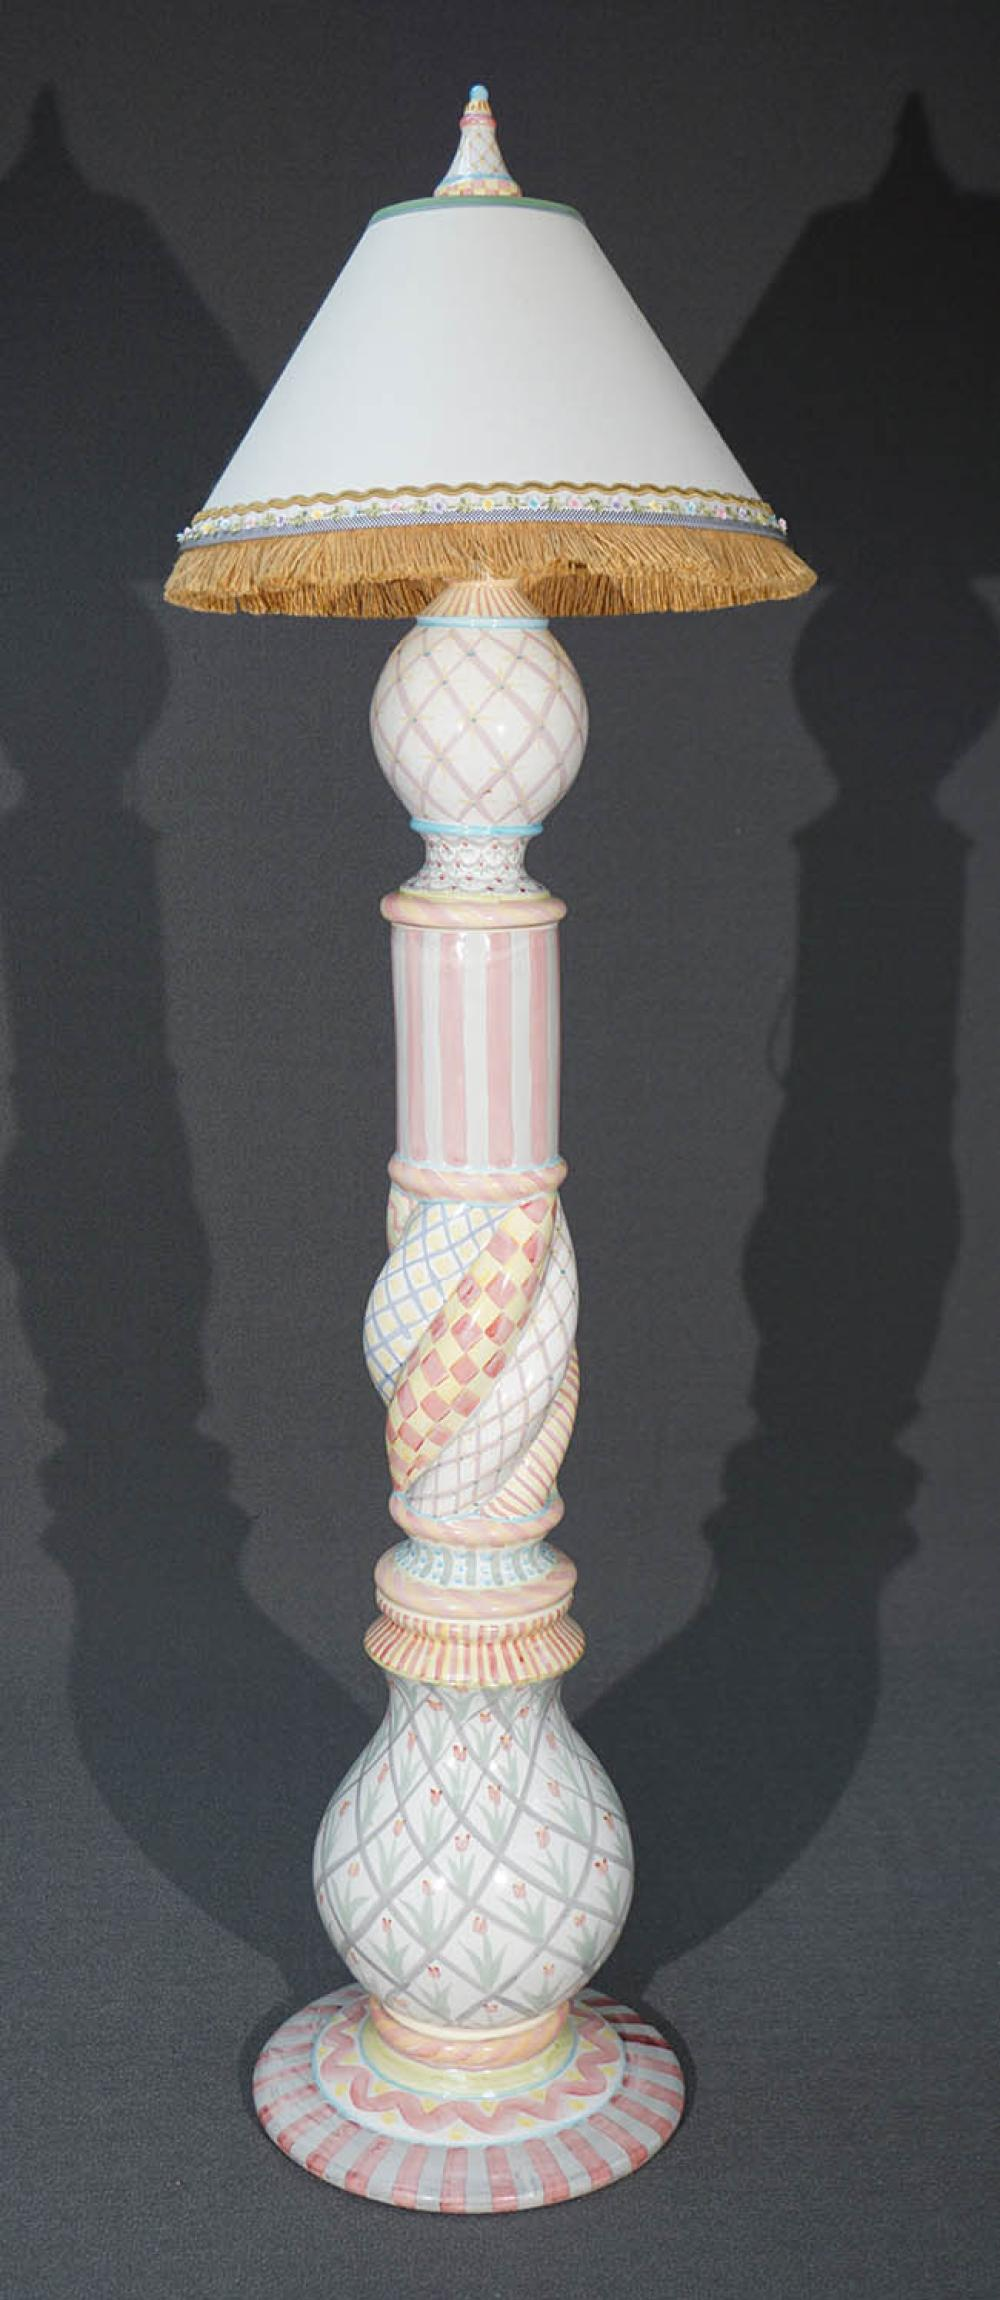 MacKenzie-Childs Art Pottery Floor Lamp